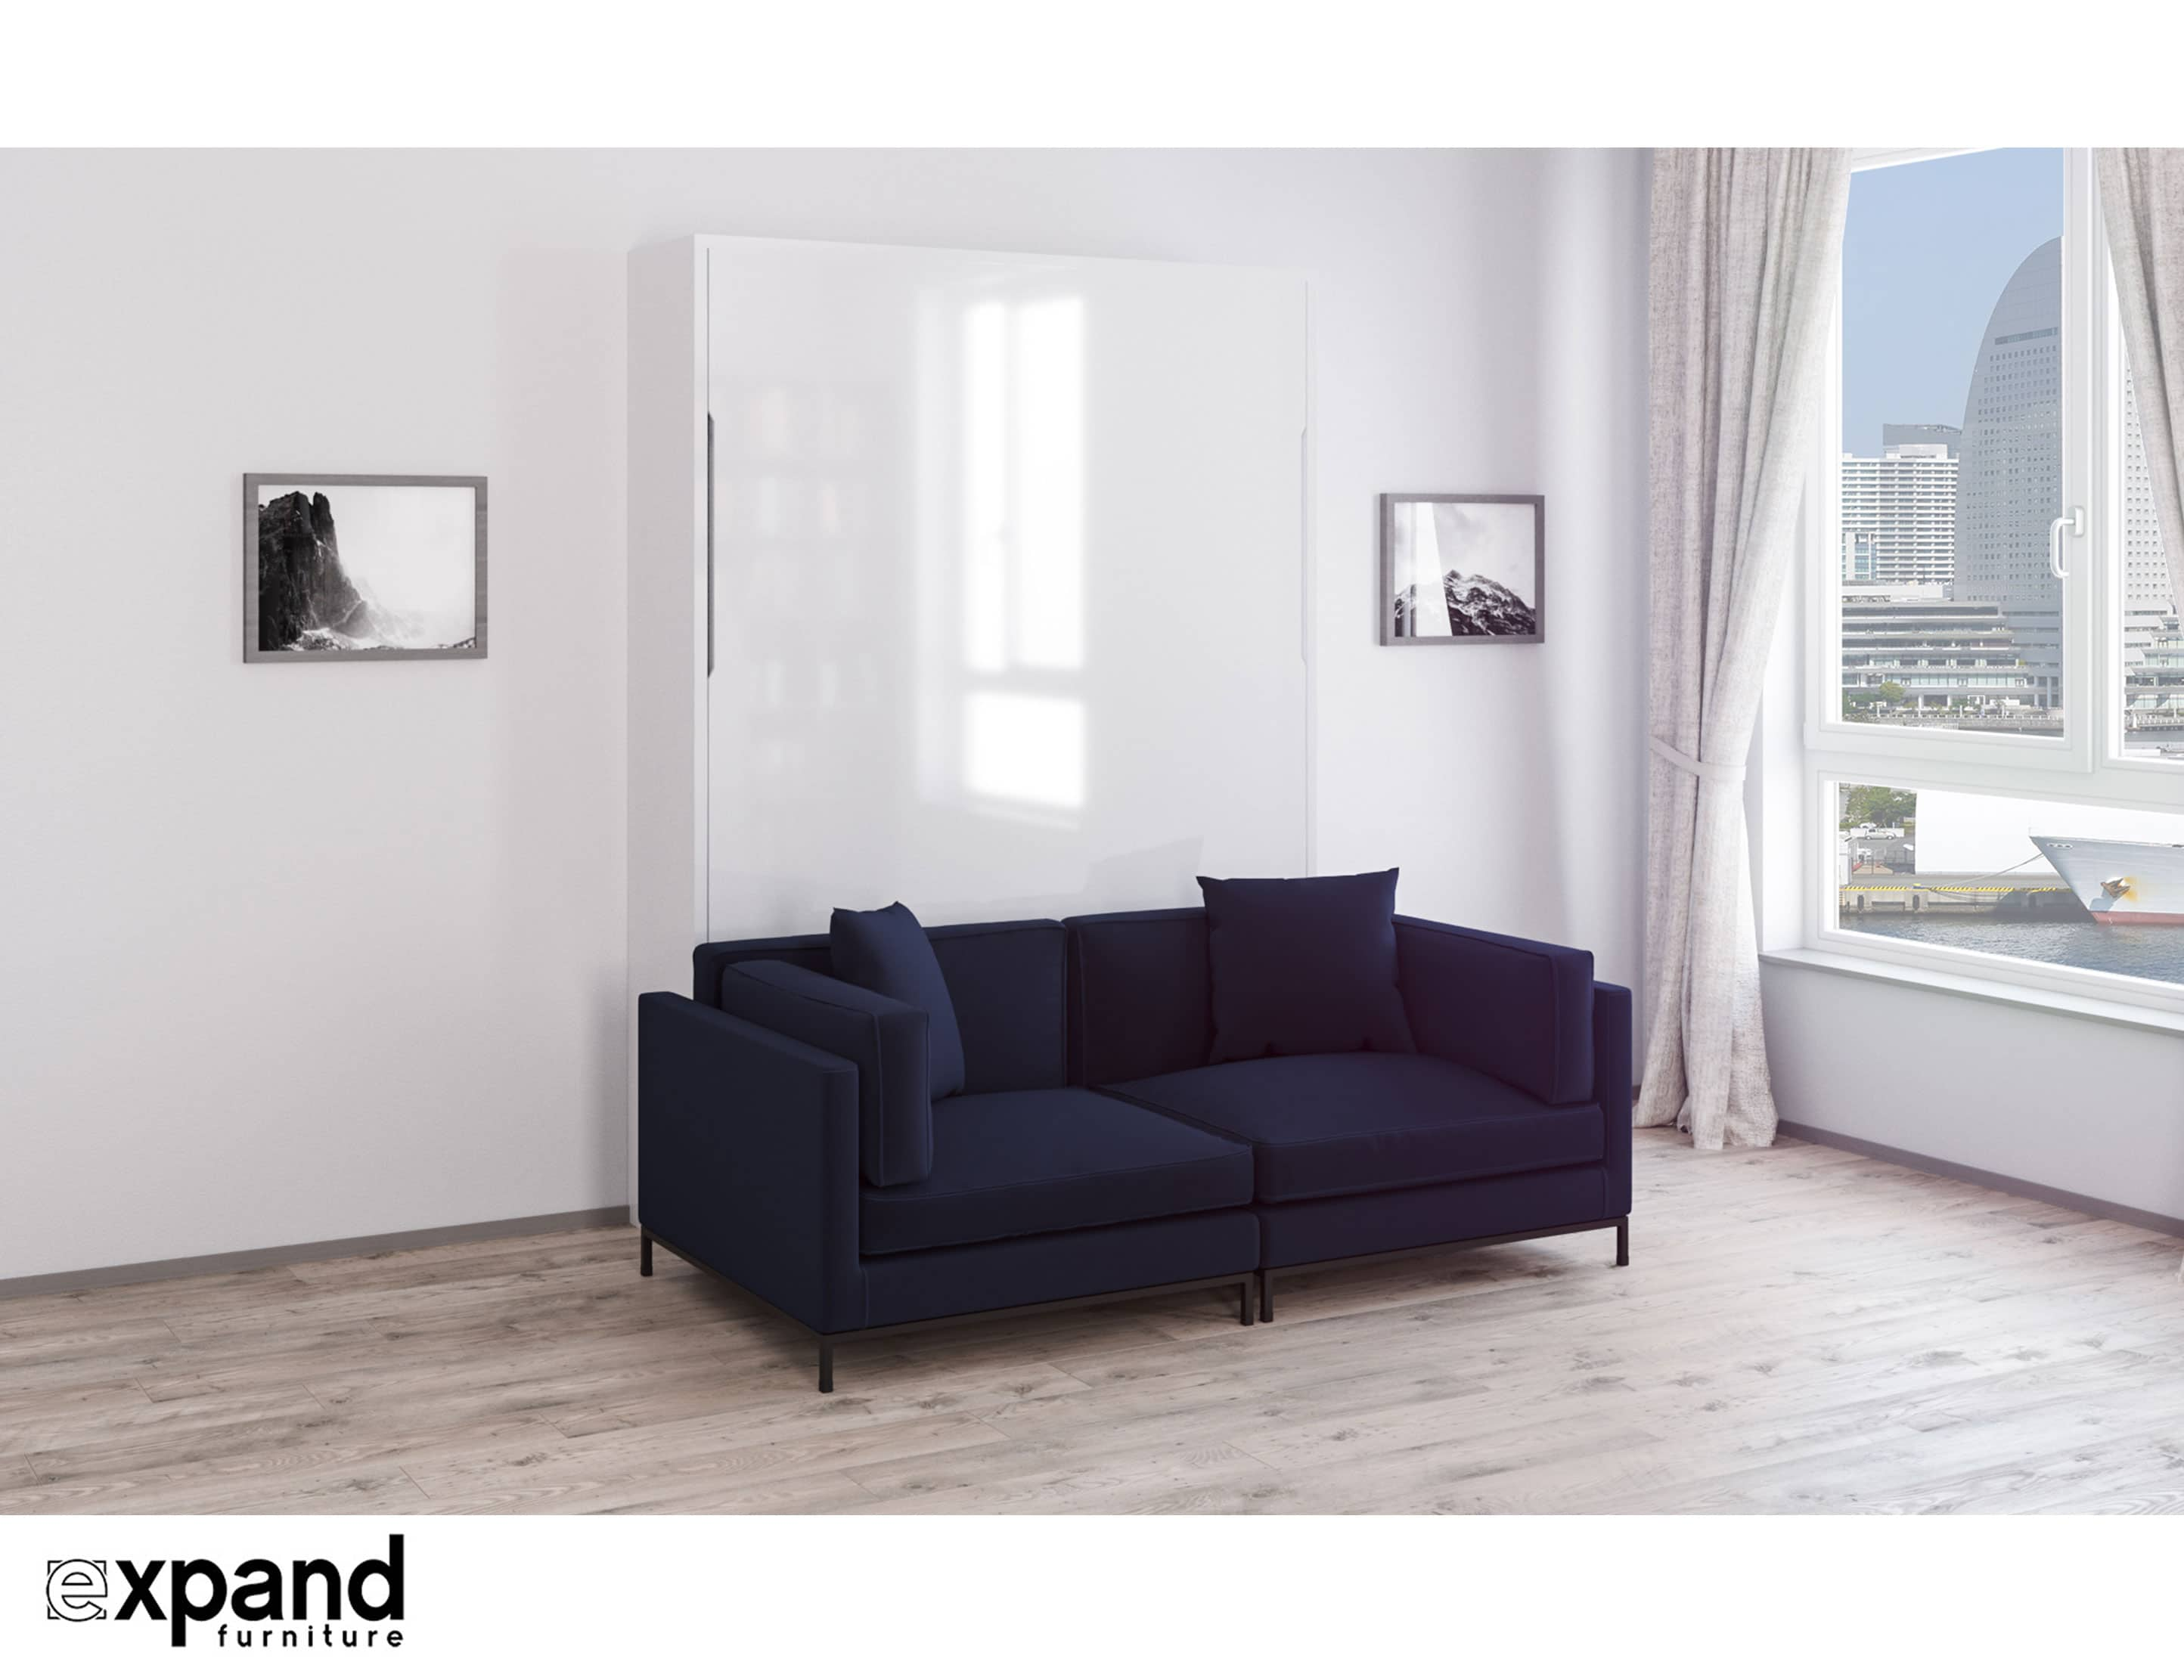 Murphysofa Migliore 2 Seat Sofa In Leather Or Microfiber